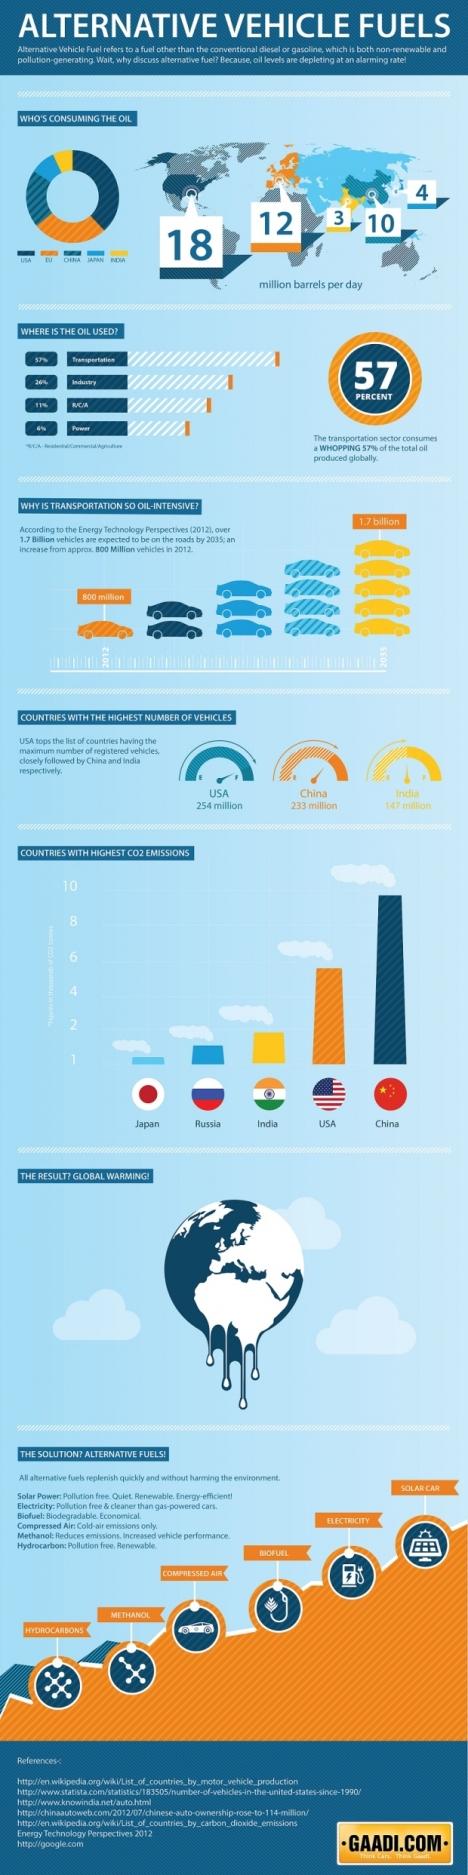 Infographic-Vehicles-Alternative-Fuel1-620x2485